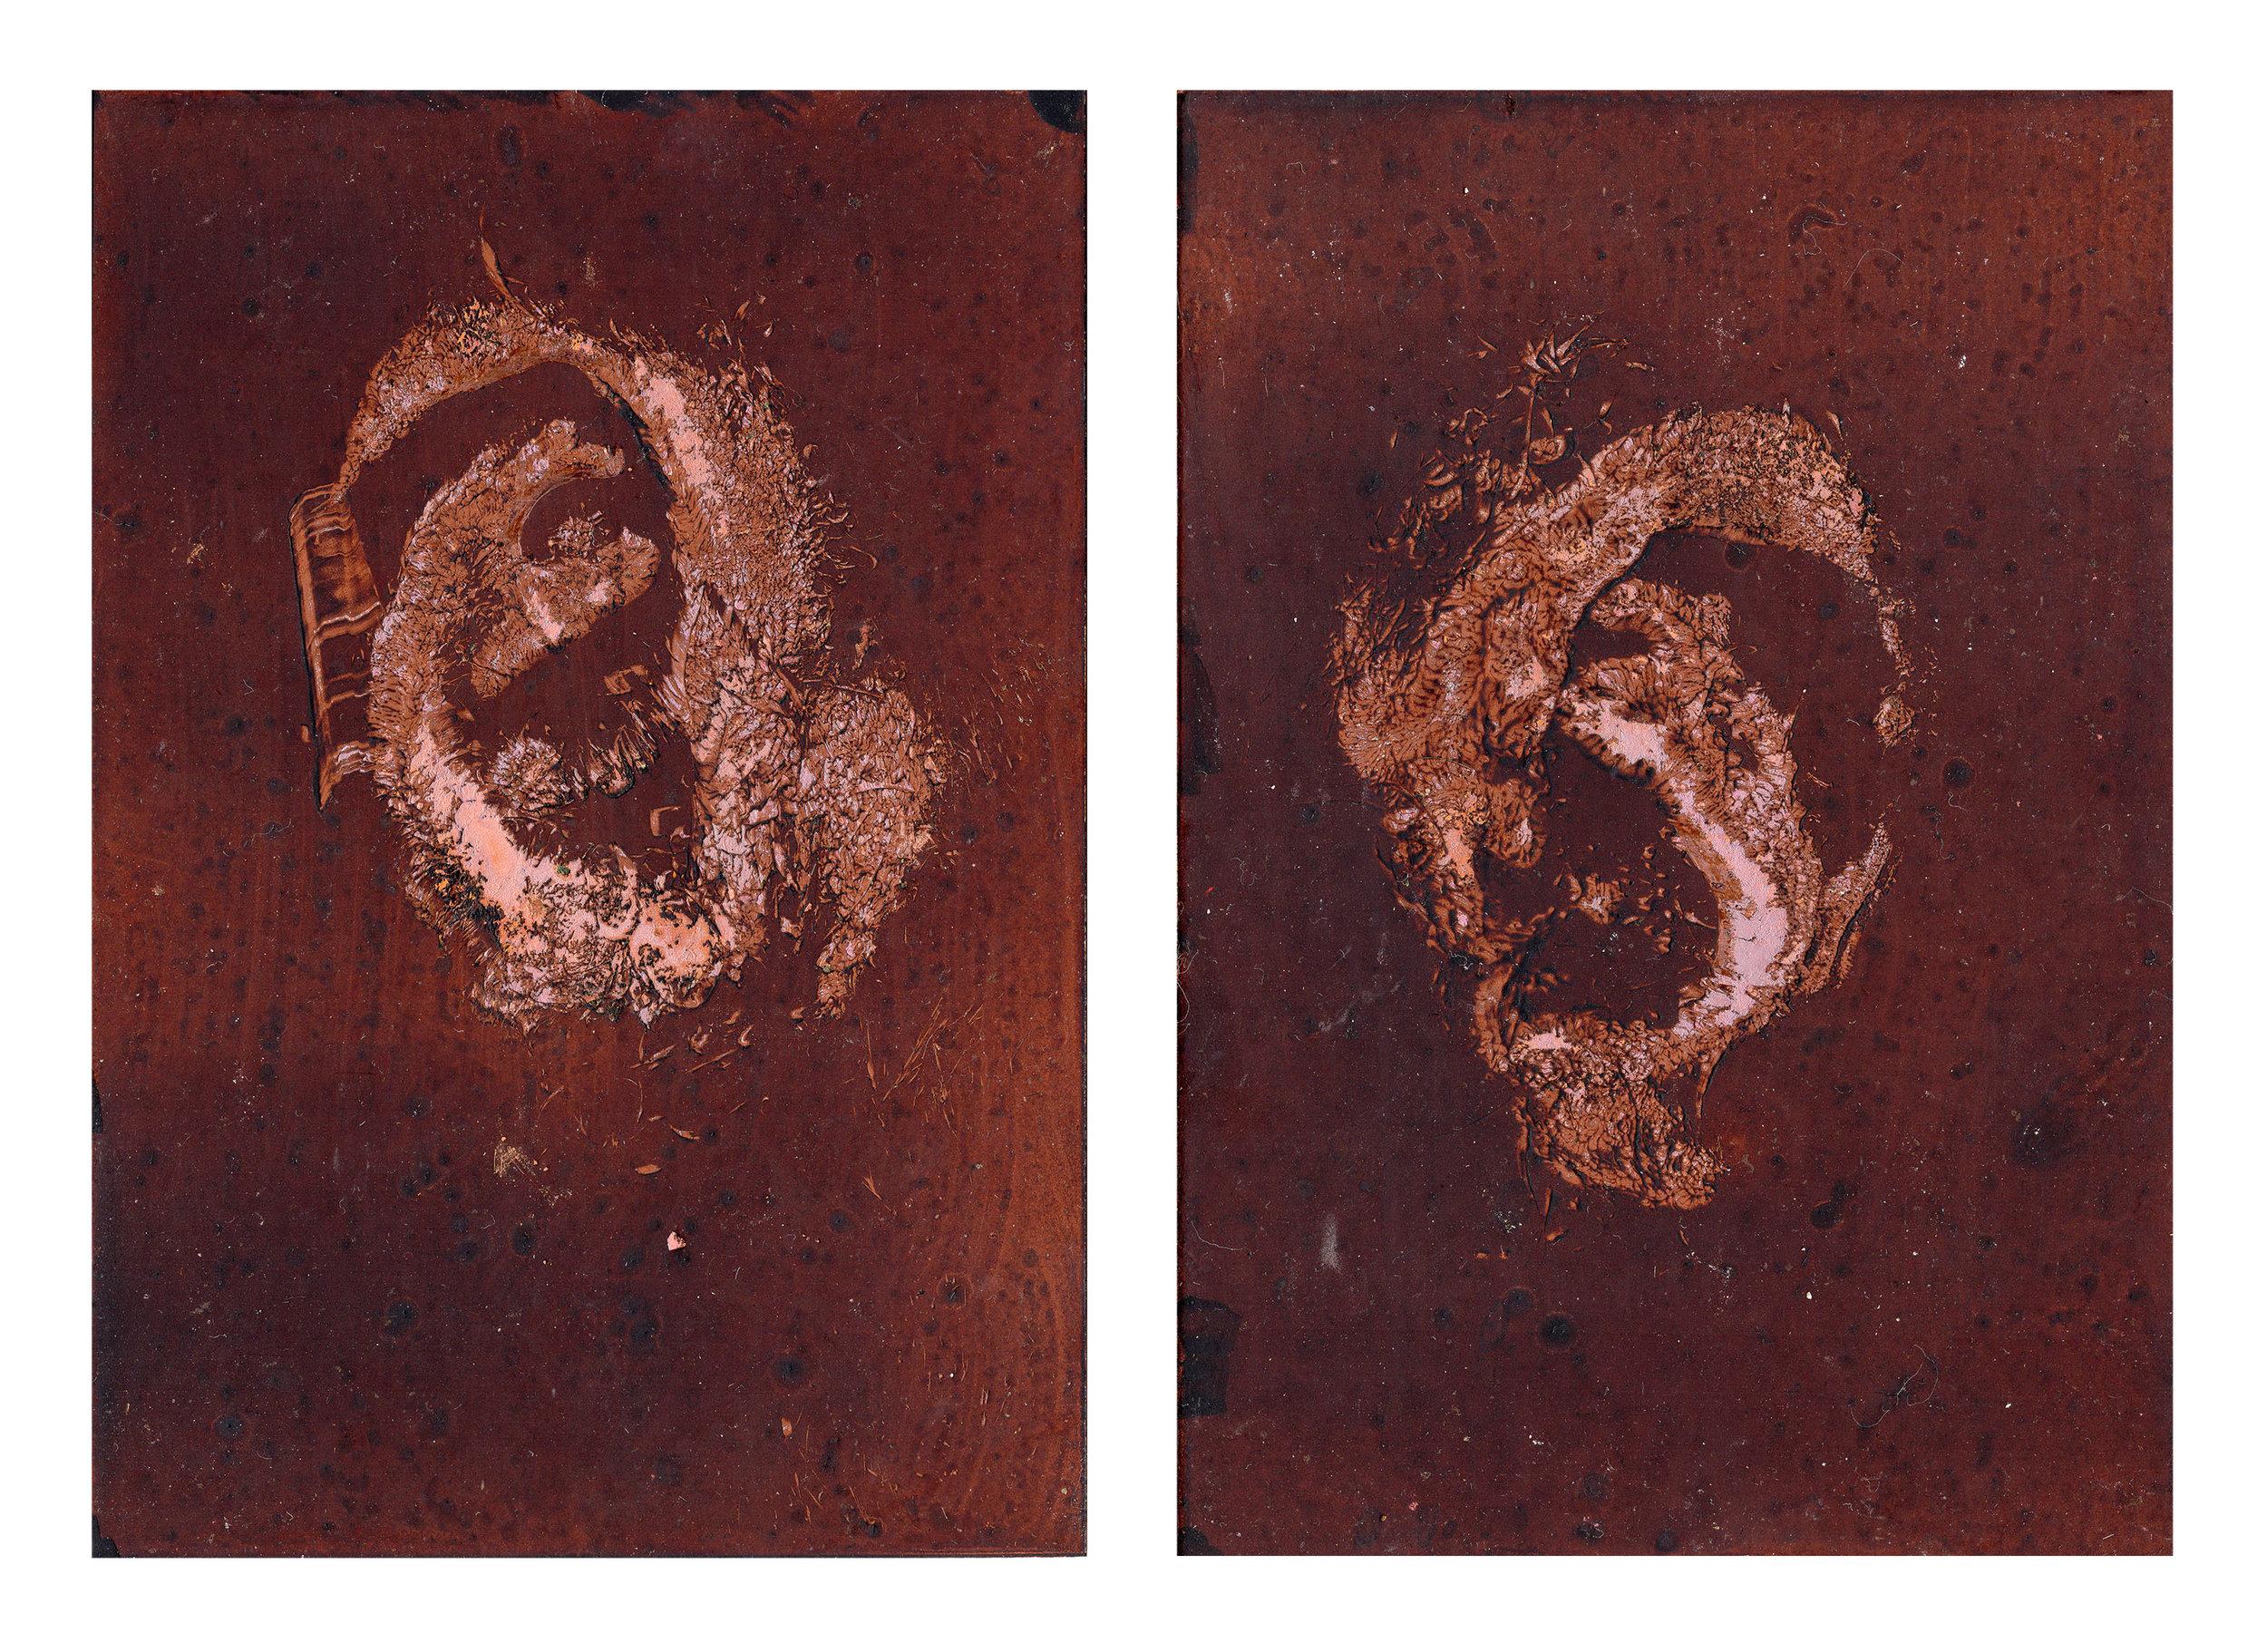 Selva Aparicio.  Gentle Transaction I,  2018. Oil of cadaver #86 on copper plate. 7 x 5 in.